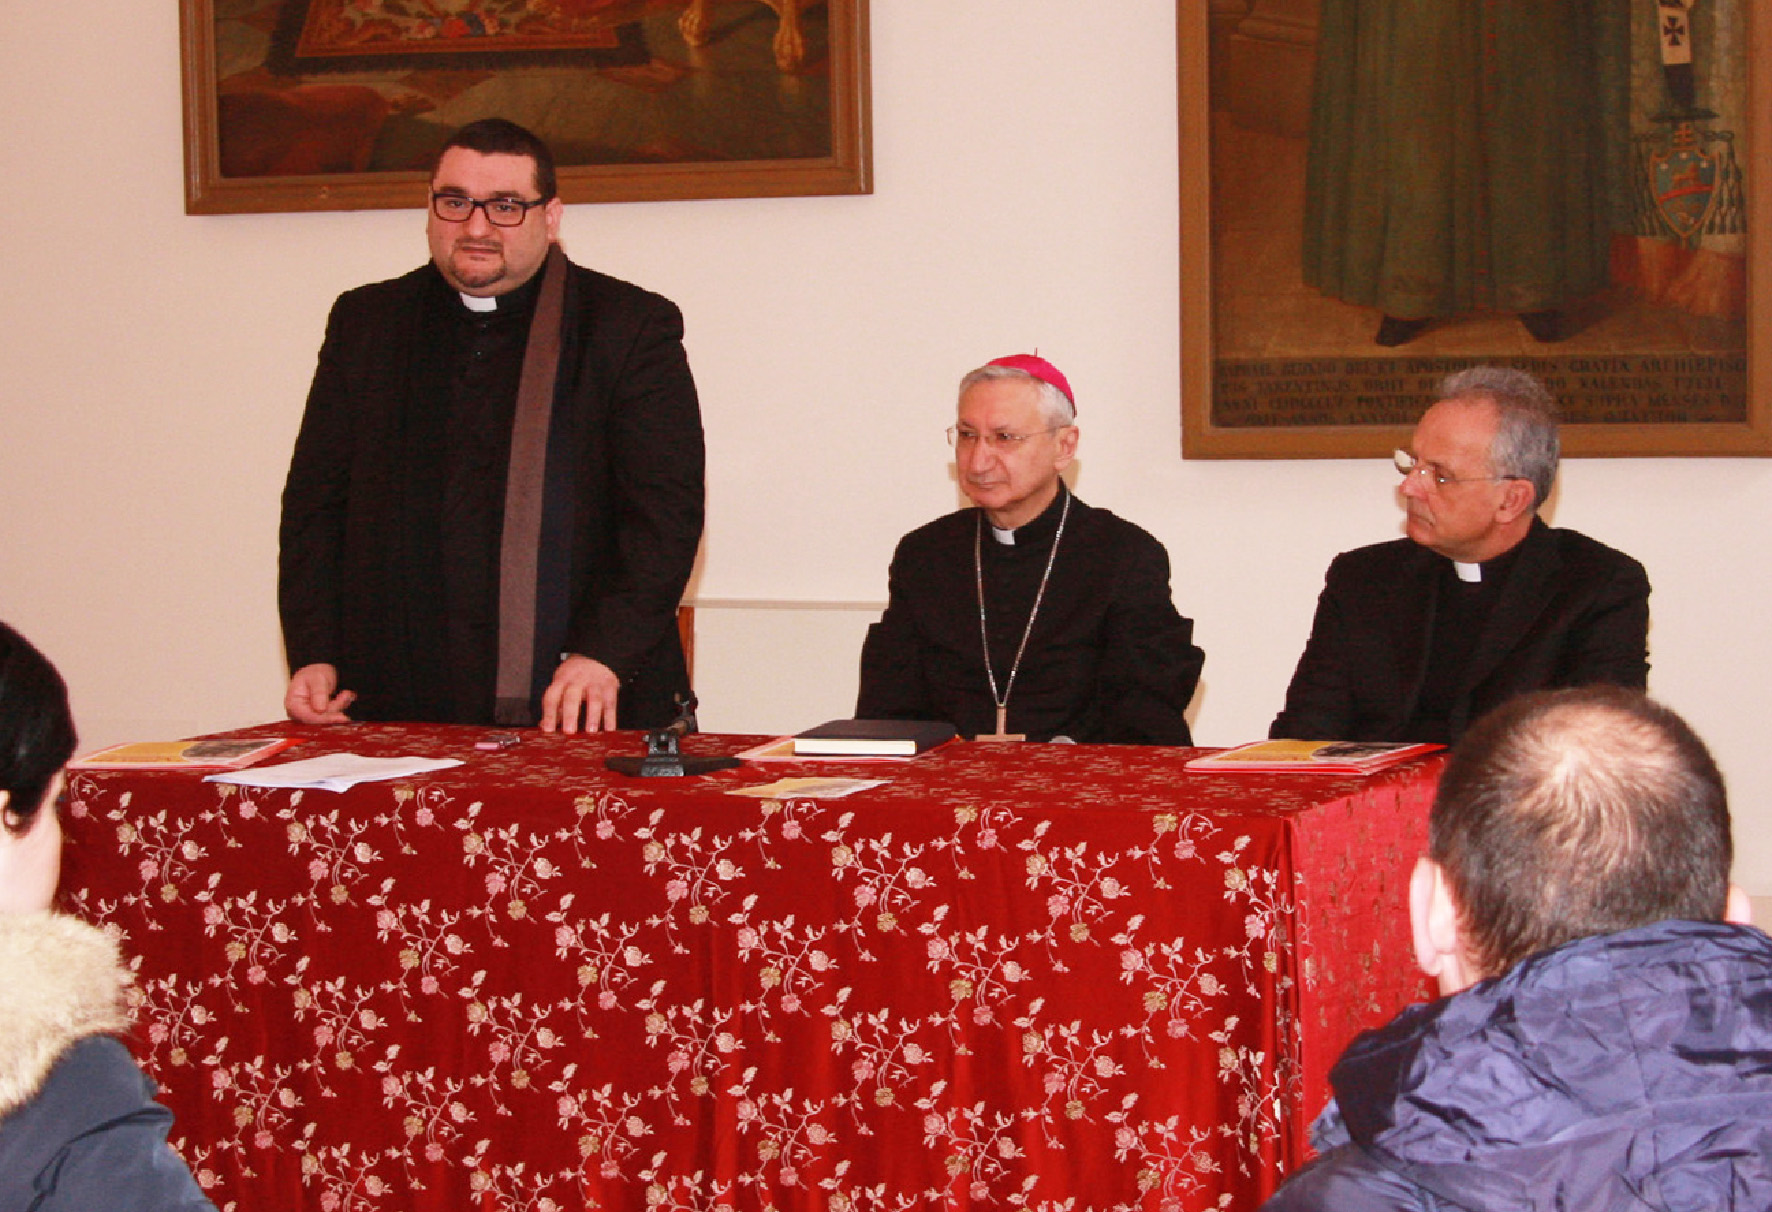 Don Emanuele Ferro larcivescovo Mons. Filippo Santoro e don Gino Romanazzi